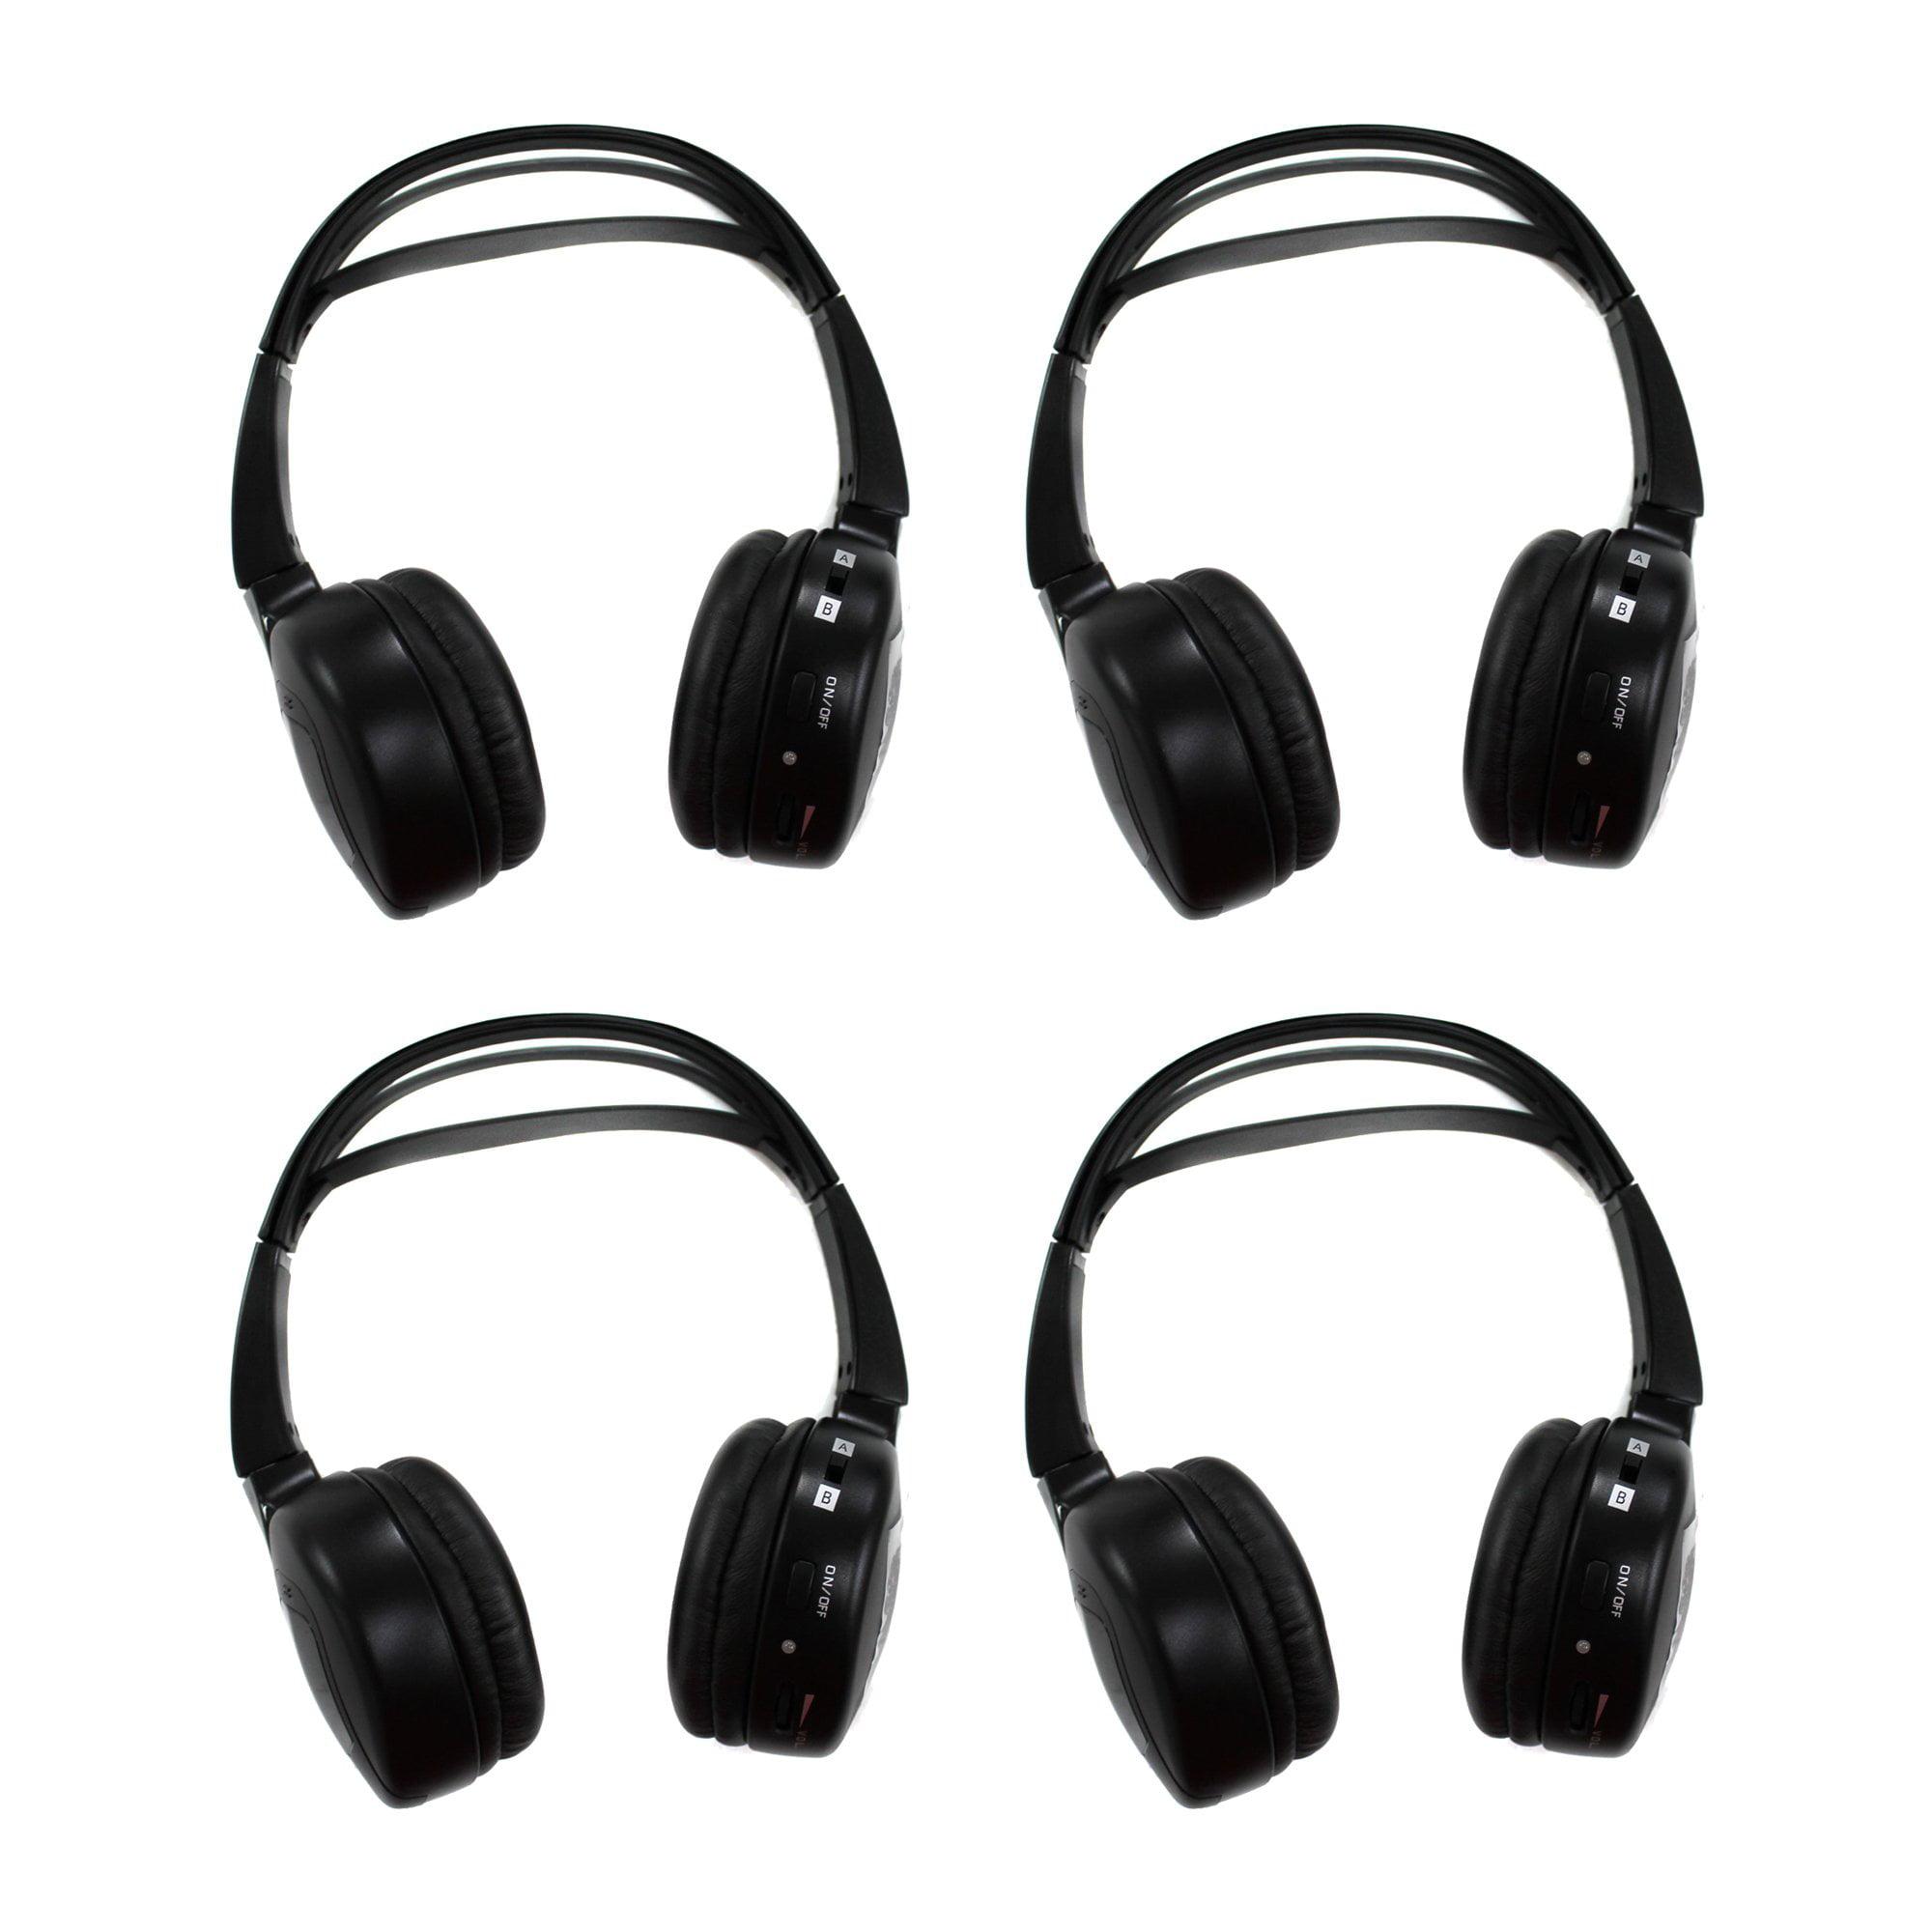 Audiovox Flat Fold 2-Channel Infrared Audio Wireless Headphones (4 Pack) | IR2 by Audiovox